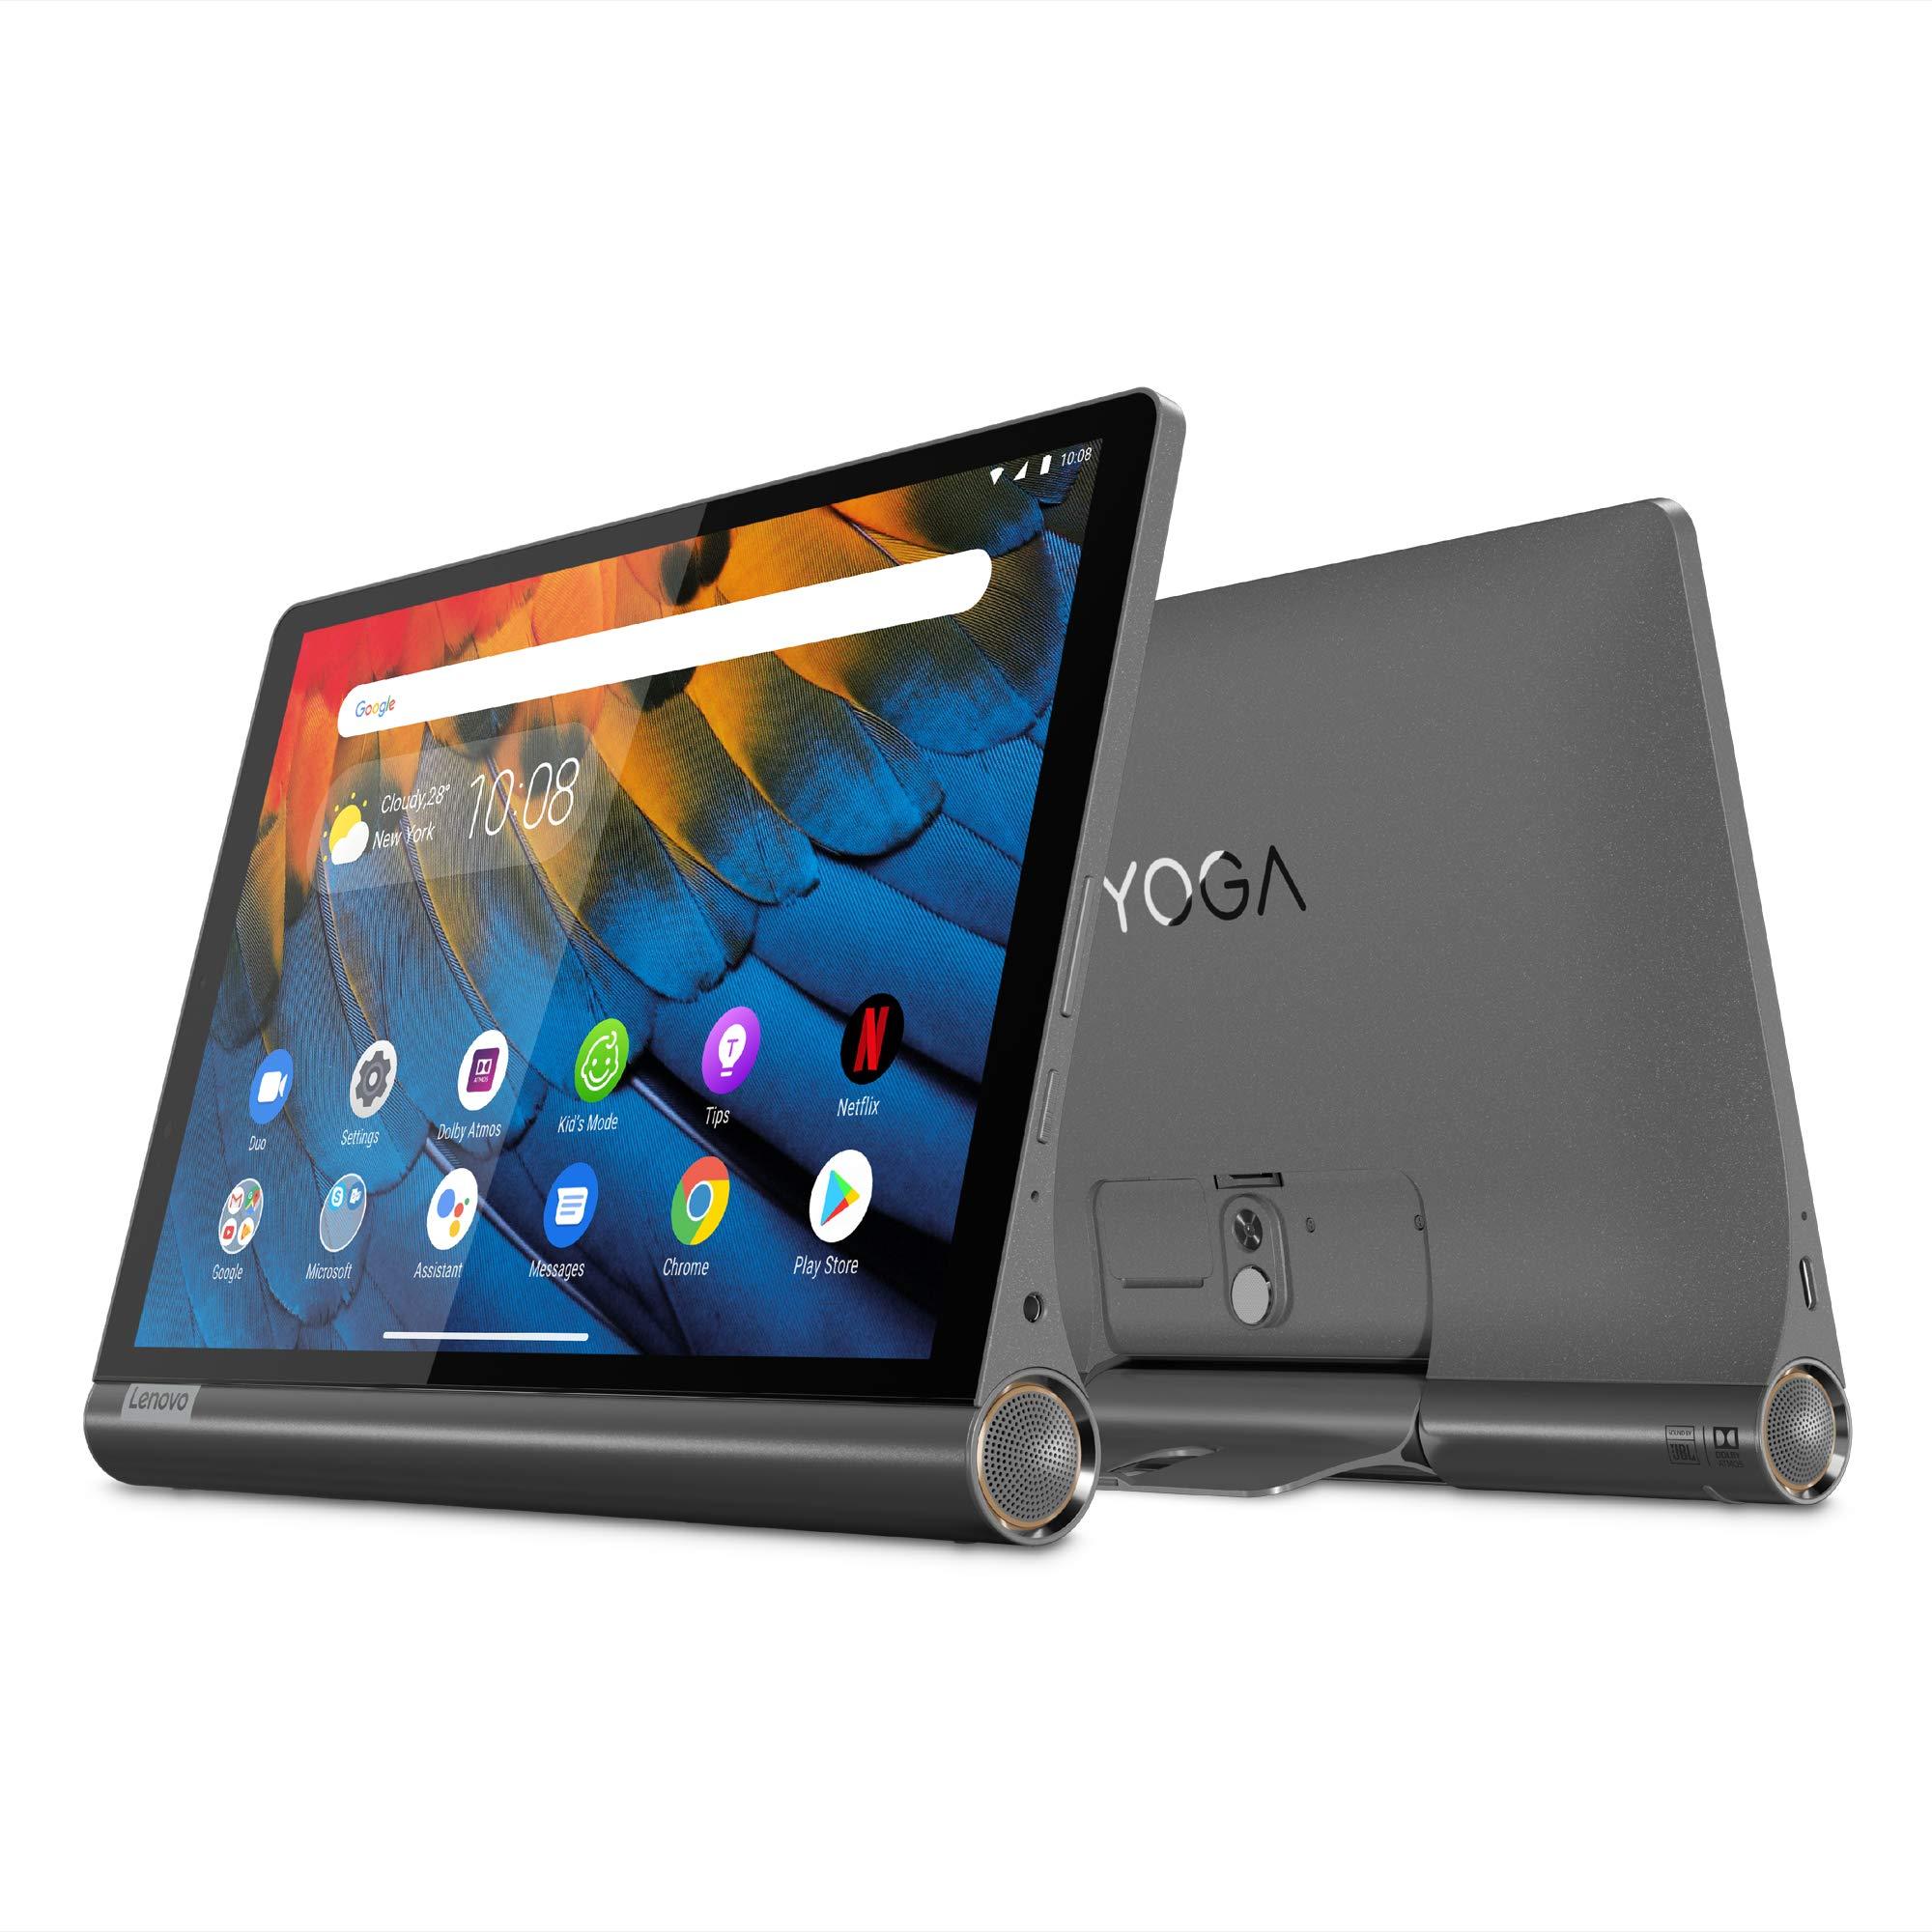 Lenovo Yoga Smart Tab (YT-X705X), 10.1 inch Tablet, Qualcomm Snapdragon 439 Processor, 4GB RAM, 64GB Storage, WiFi+4G LTE, Android OS, Iron Grey - [ZA540000AE]